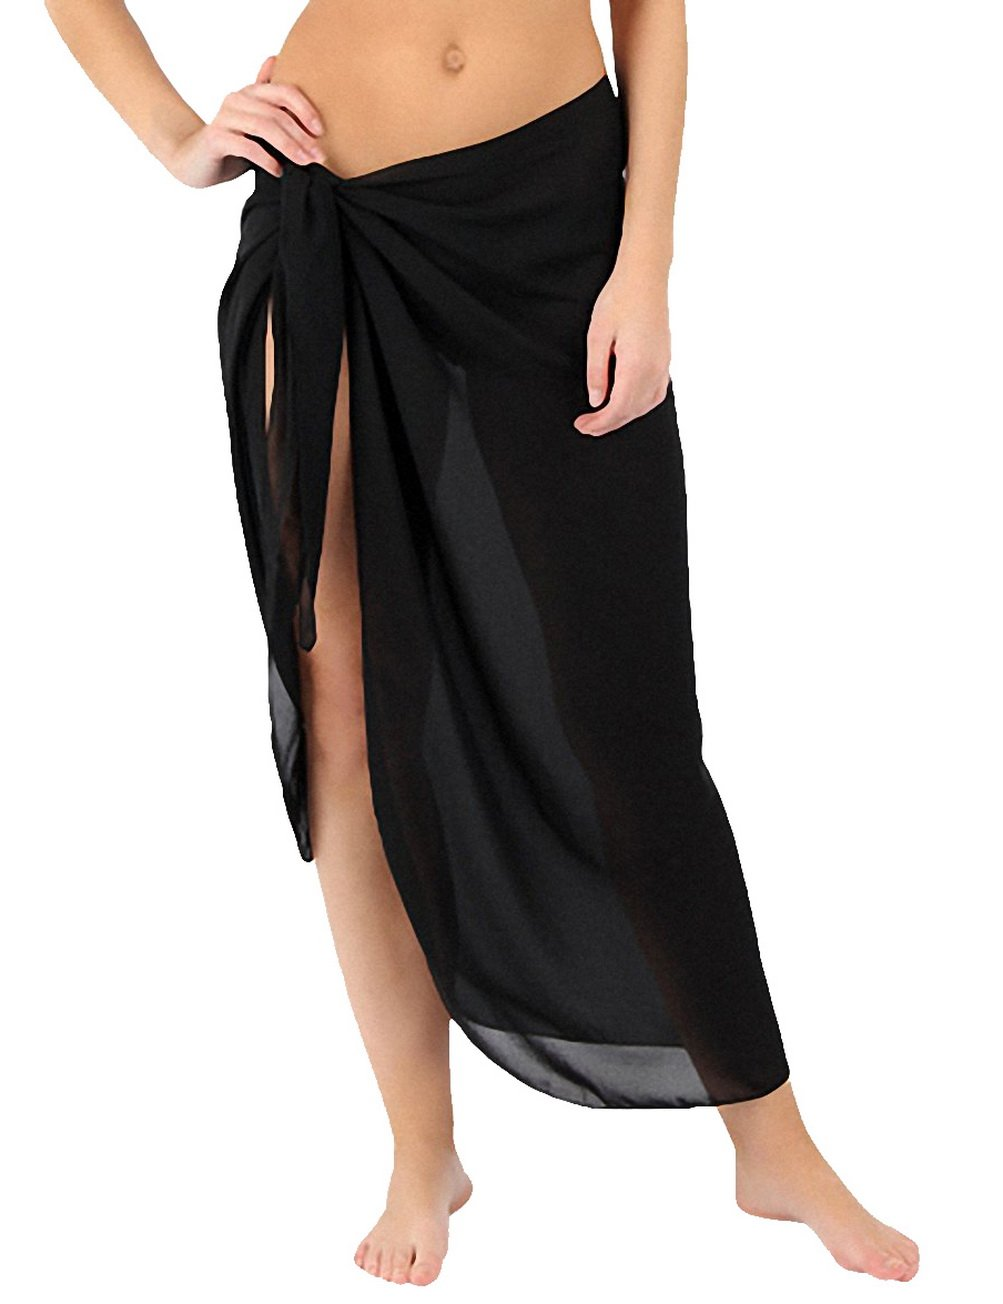 64ecd1a76e4d8 ChinFun Women's Soft Wrap Beach Swimwear Short/Knee Length/Long Cover Up  Pareo Swimsuit